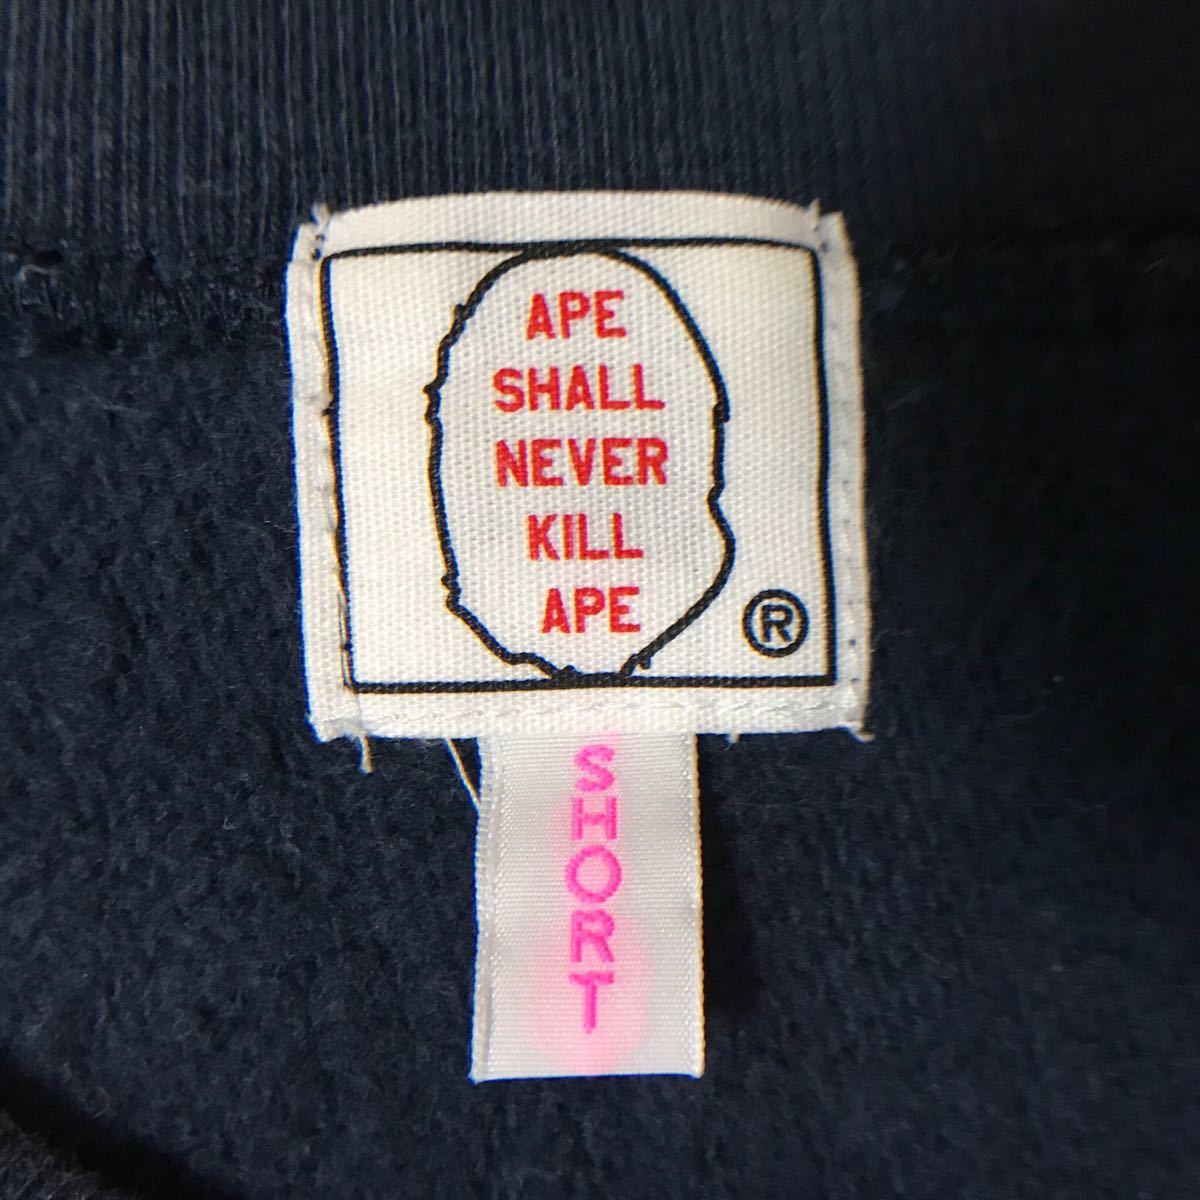 kaws × BAPE レディース 長袖スウェット navy a bathing ape apee エイプ ベイプ アベイシングエイプ カウズ ladies nigo